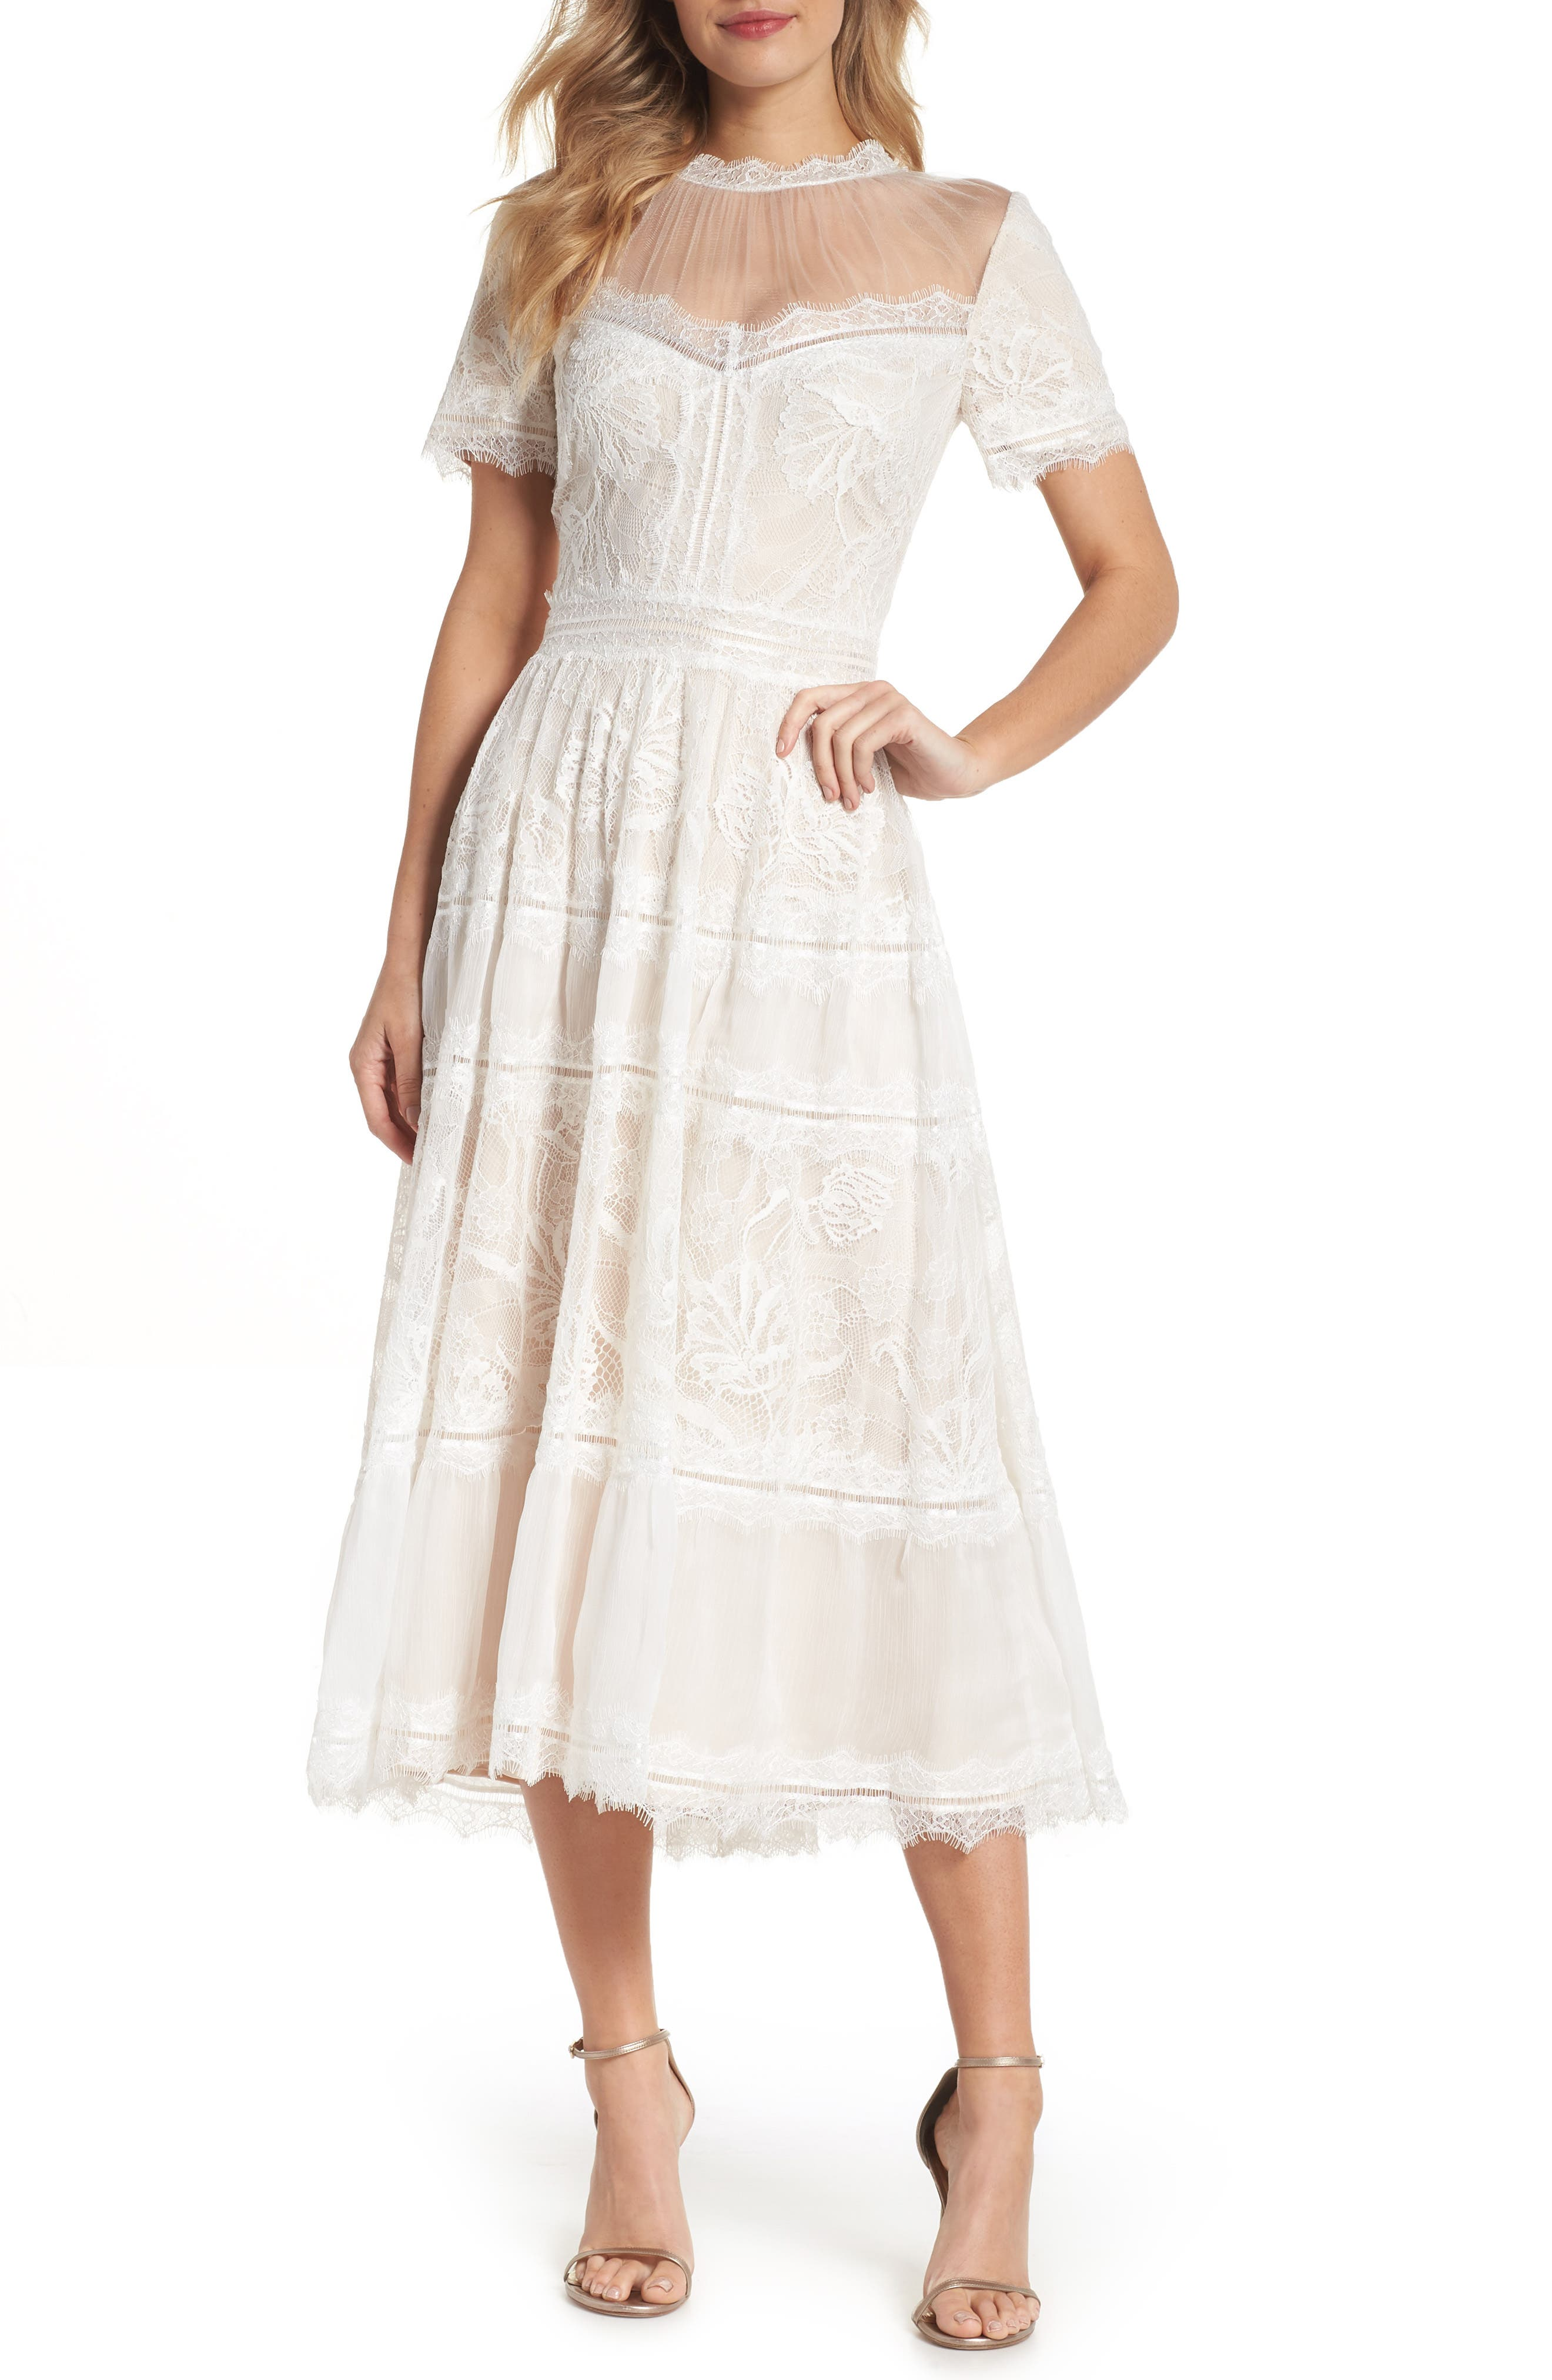 Lace Tea-Length Dress,                         Main,                         color, Ivory/ Petal